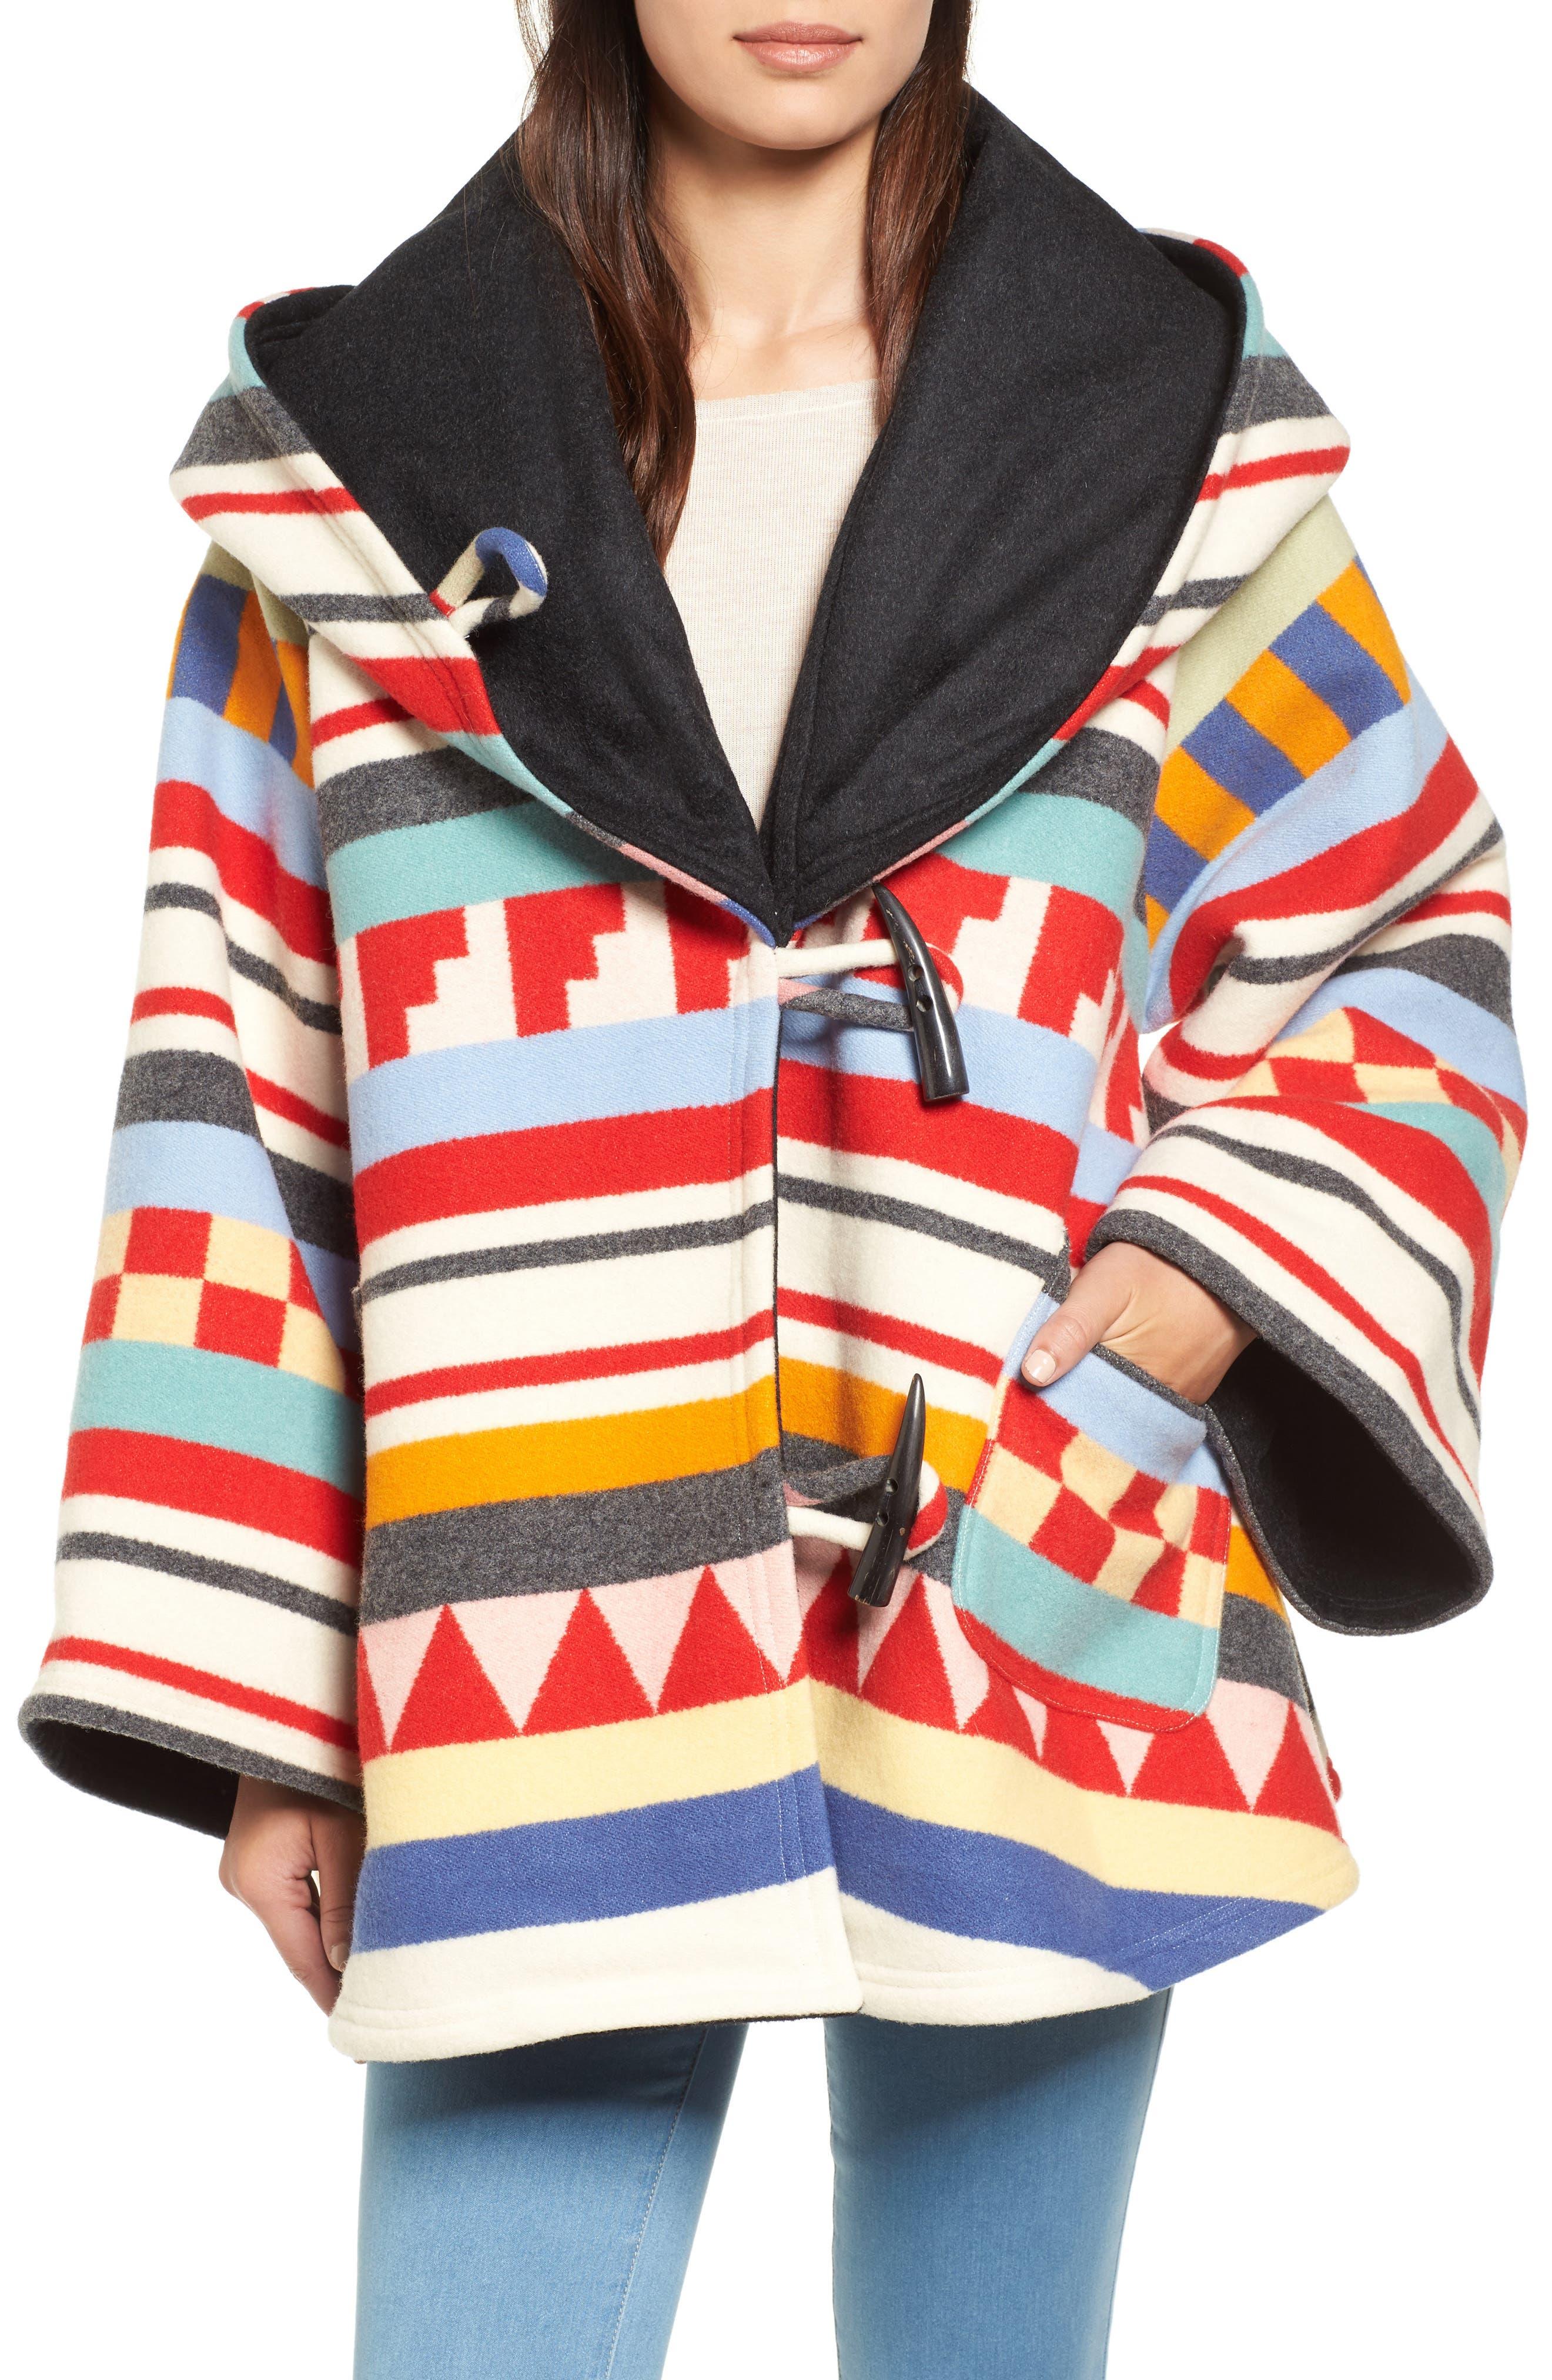 x Pendleton Wool Blend Hooded Cape,                             Main thumbnail 1, color,                             WHITE MULTI